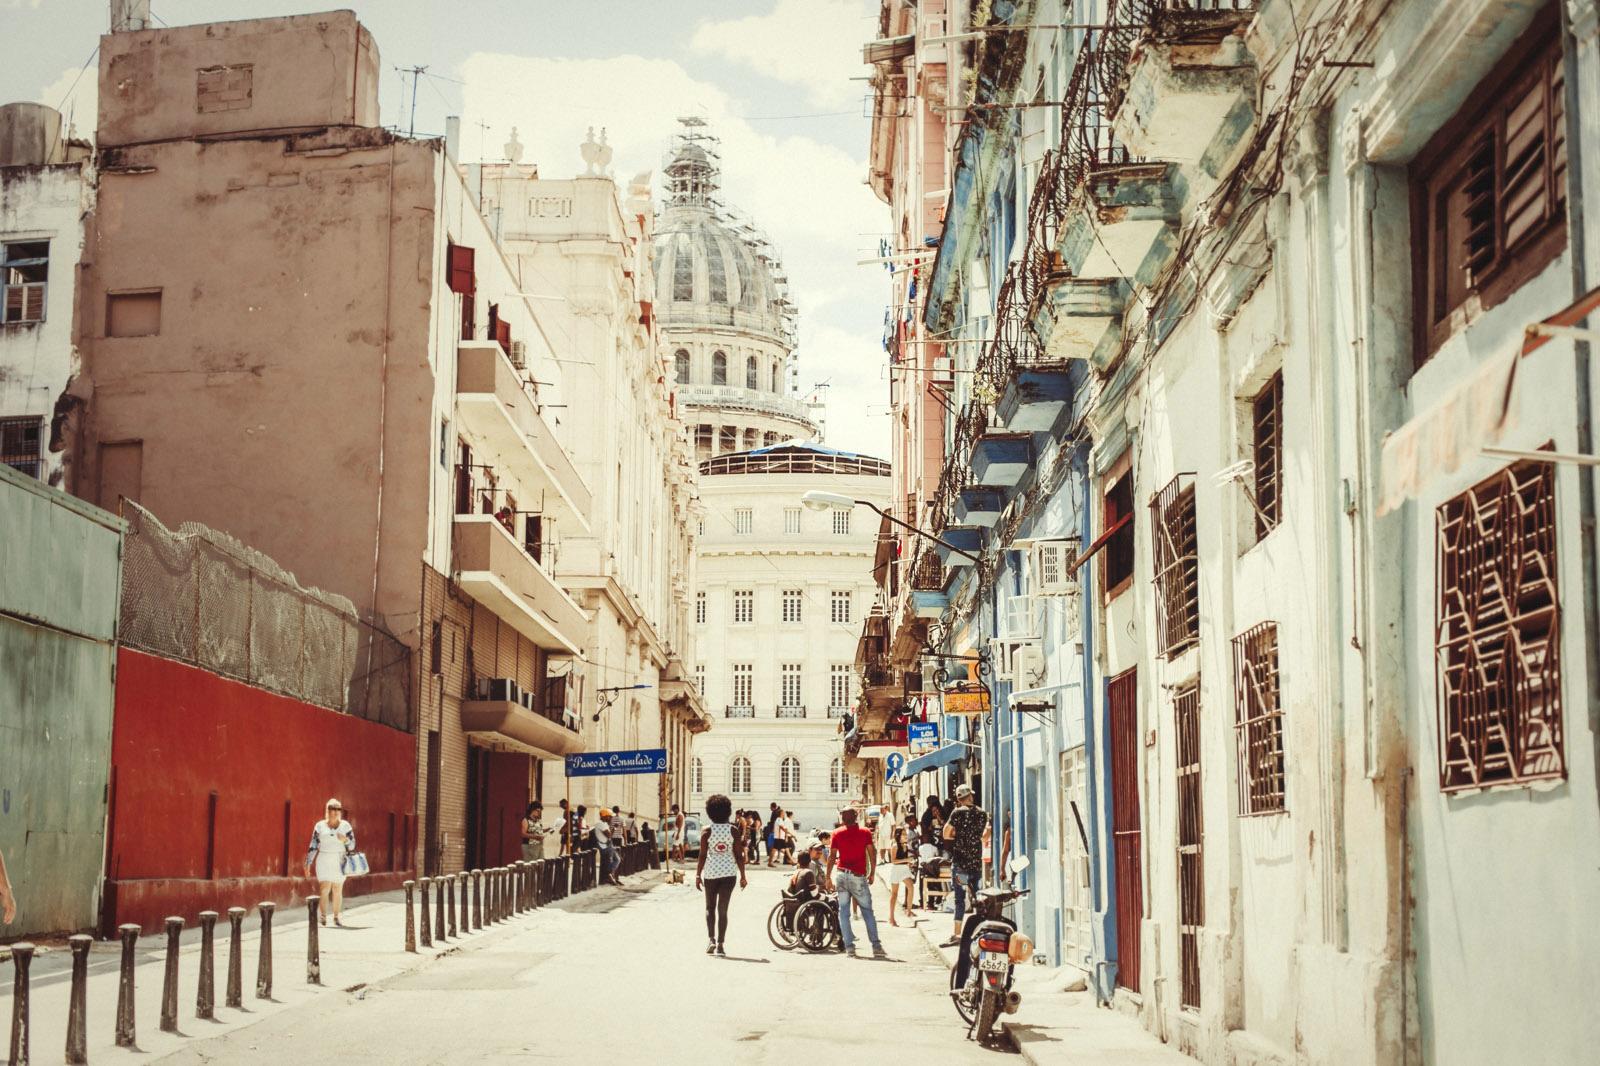 Havana travel 2018 92